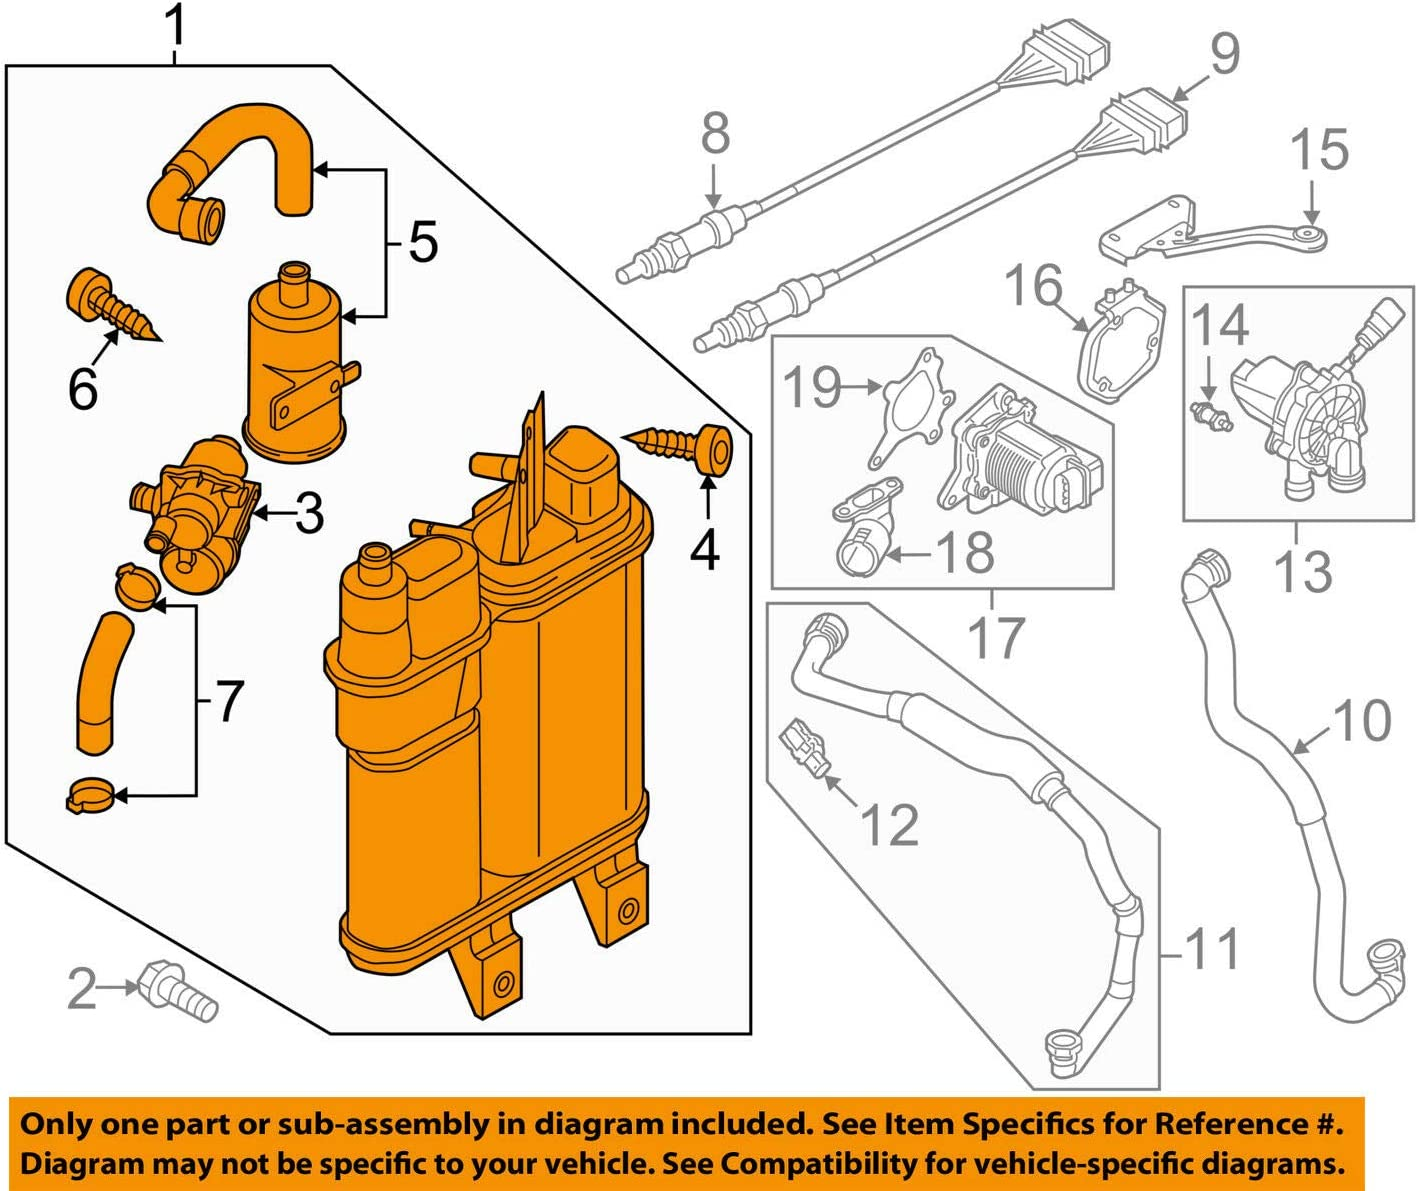 5+2 Bundle 9 Items: Method 409 15 Grey Wheels 32 Carnivore Tires 4x156 Bolt Pattern 12mmx1.25 Lug kit